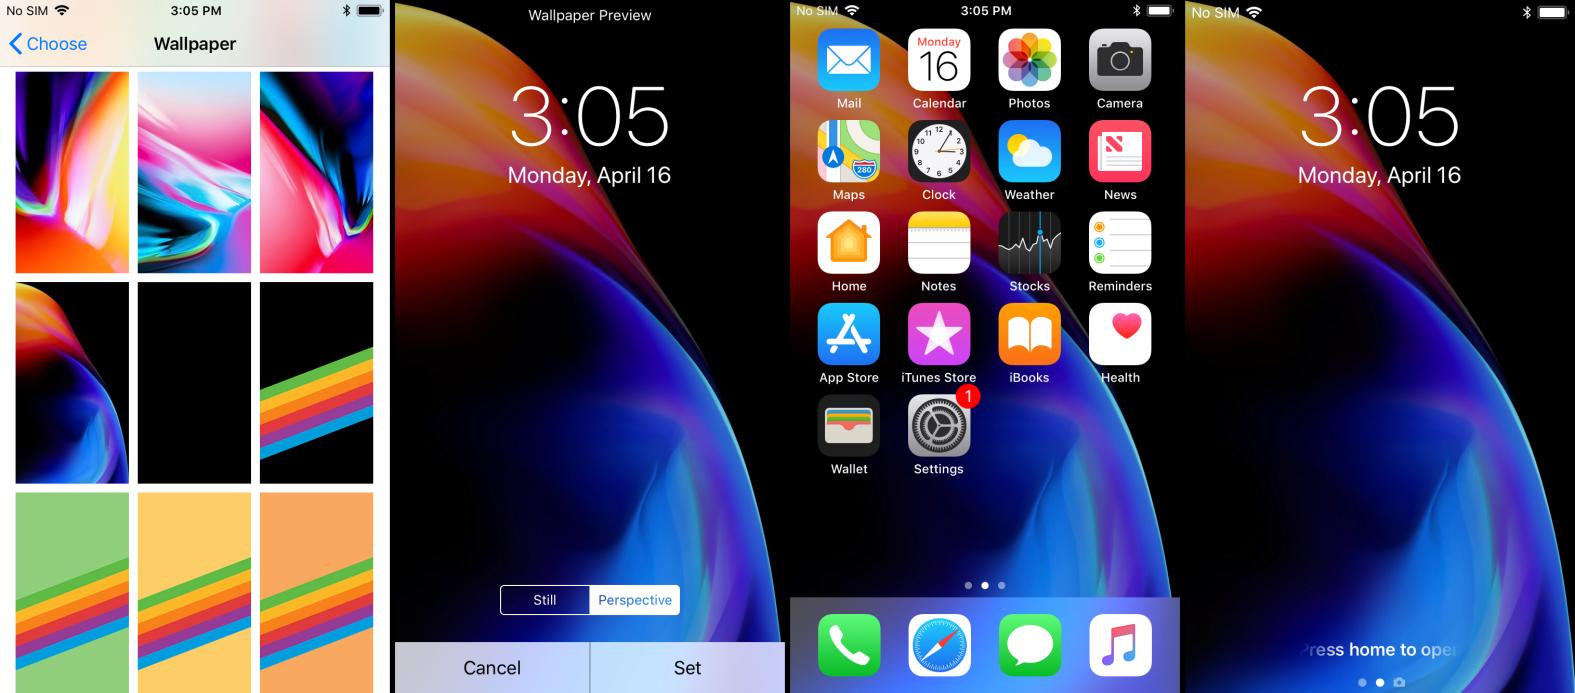 Iphone 8 Product Red 限定の壁紙 他iphone Ipad Macユーザーも